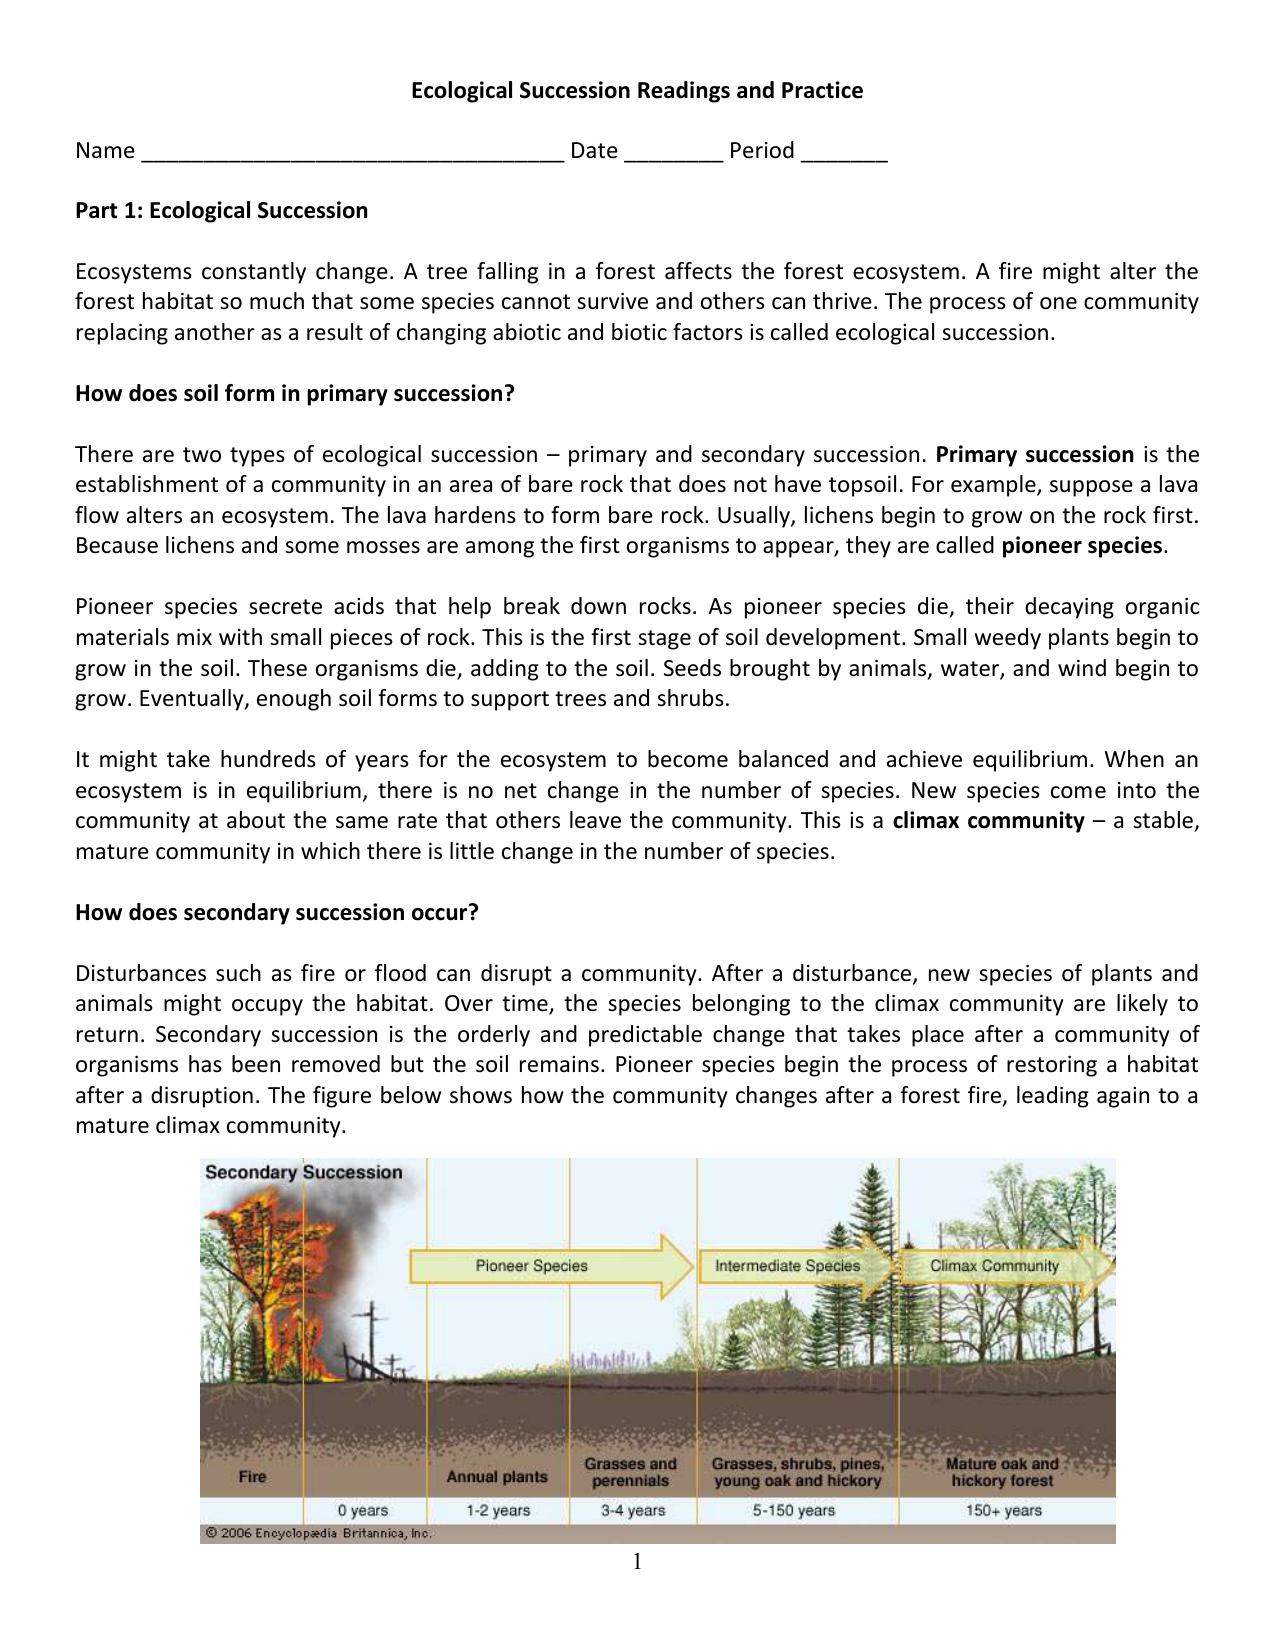 Ecological Succession Worksheet Regarding Succession Worksheet Answers